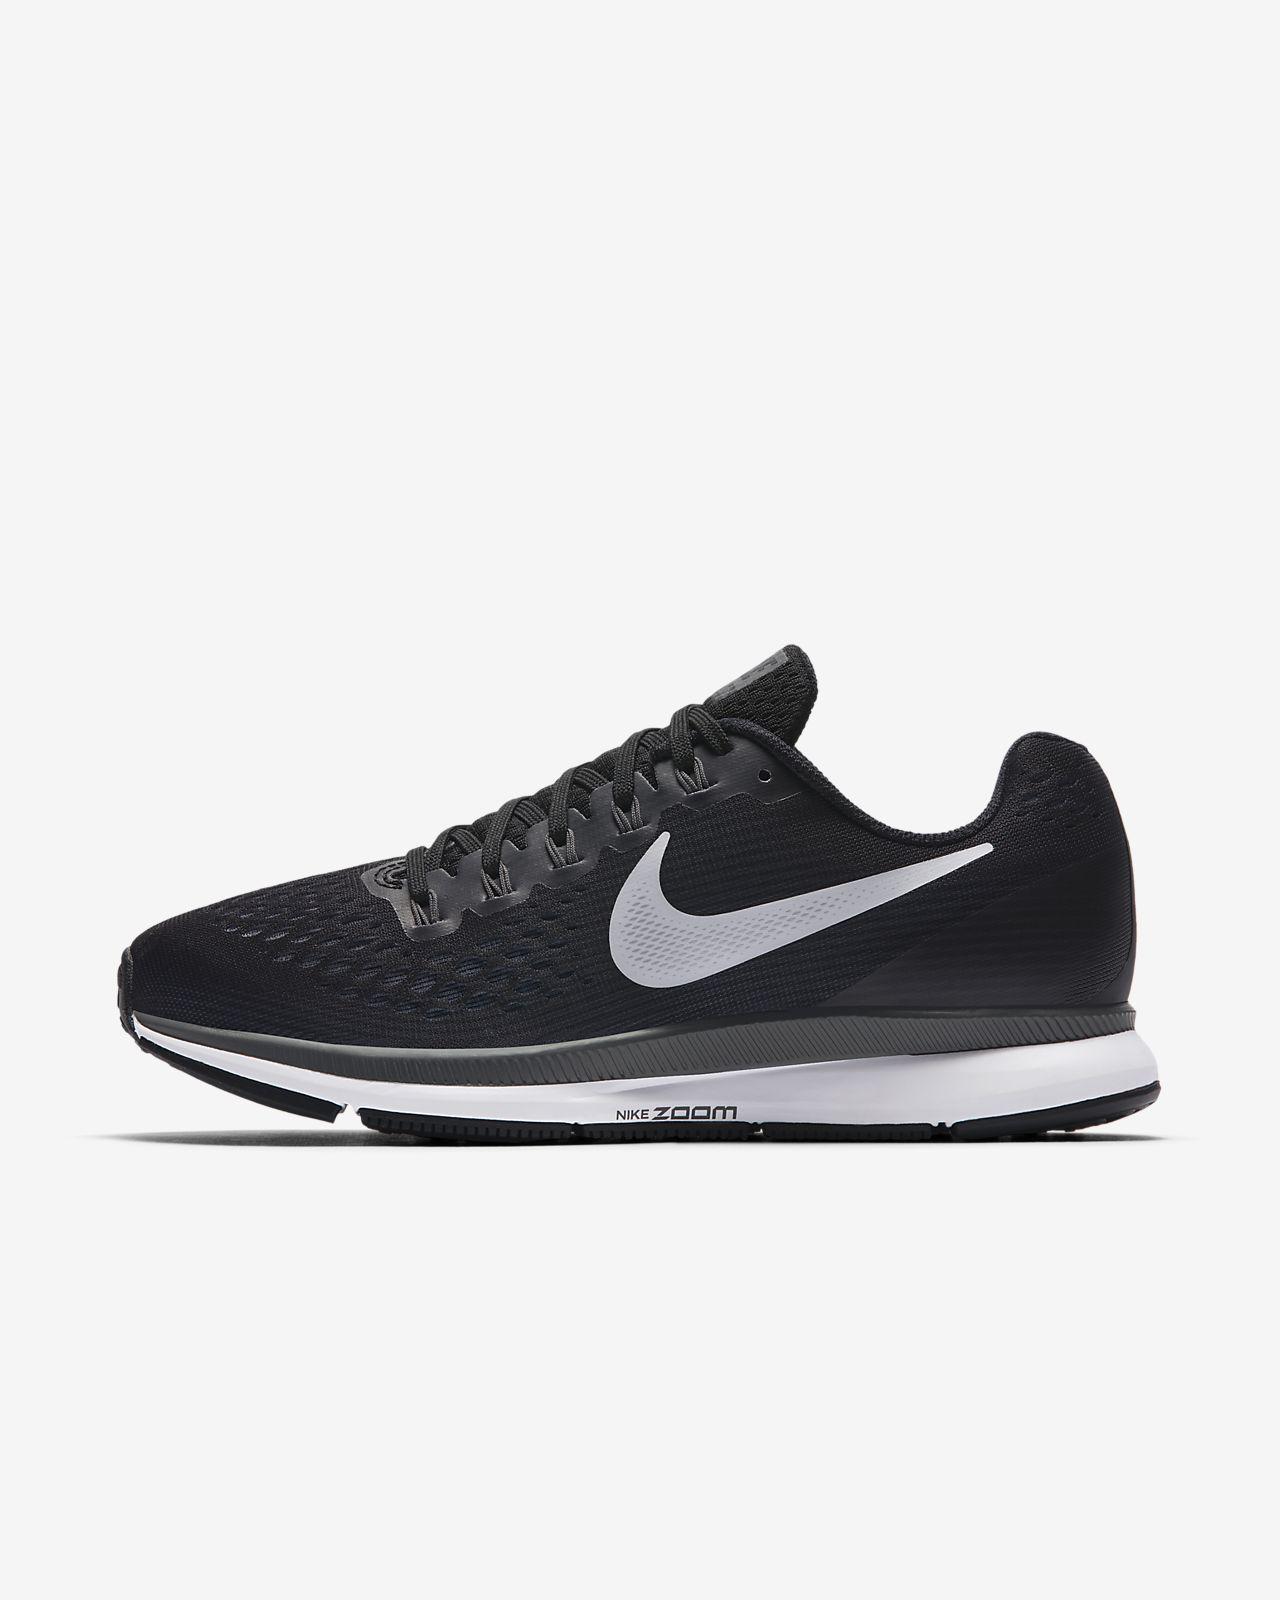 Nike Pegasus 28 Men's Size 10 Medium Gym Shoes Sneakers White & Blue